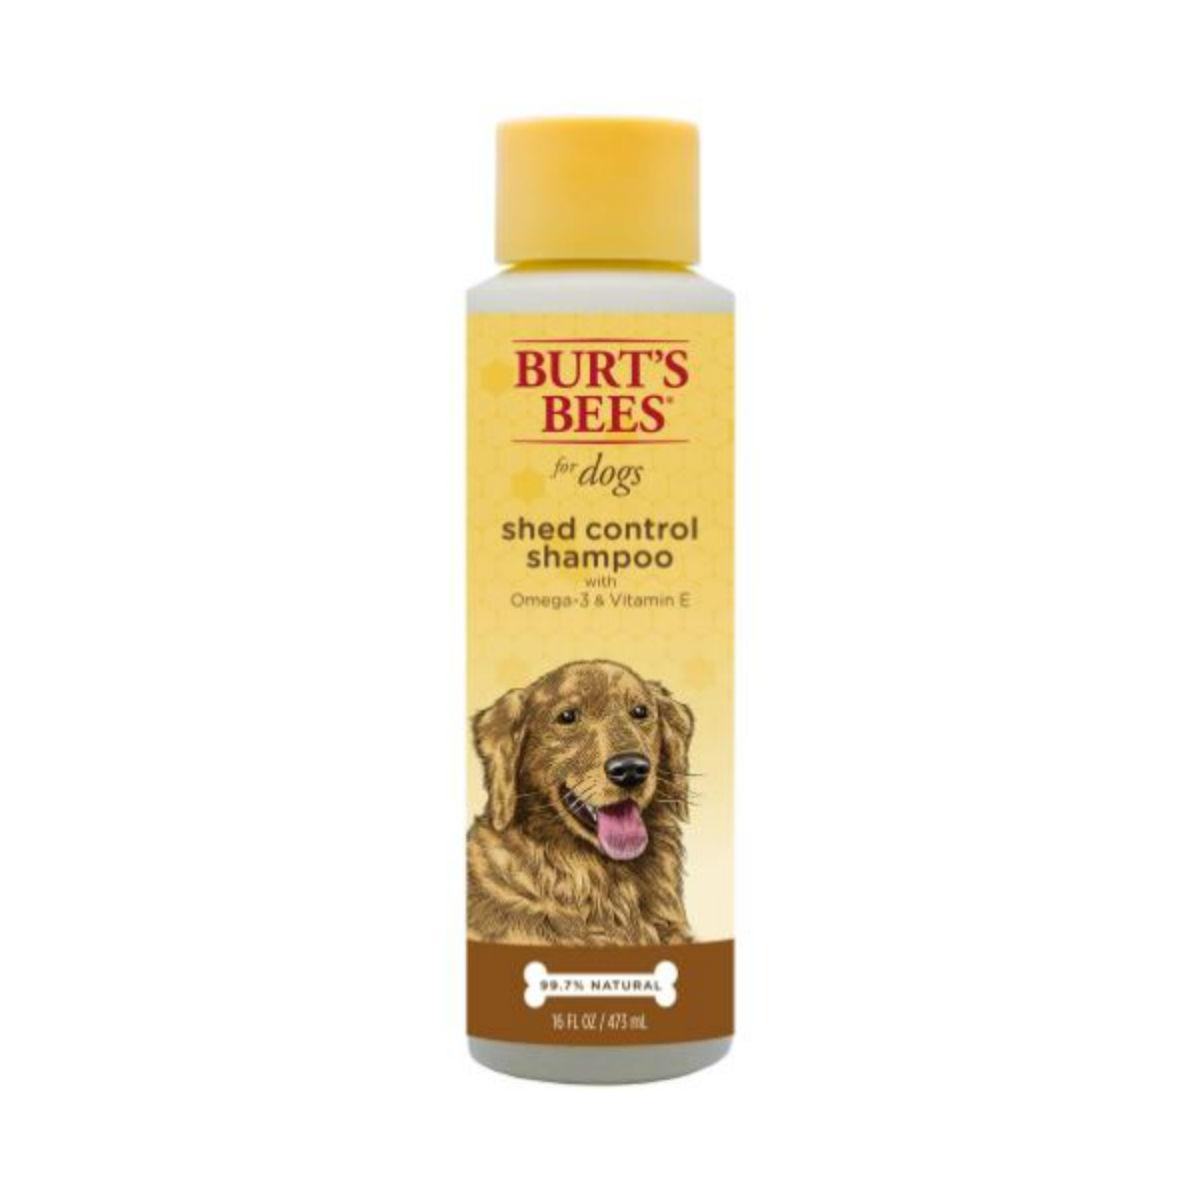 Burt's Bees Shed Control Dog Shampoo - Omega 3's and Vitamin E